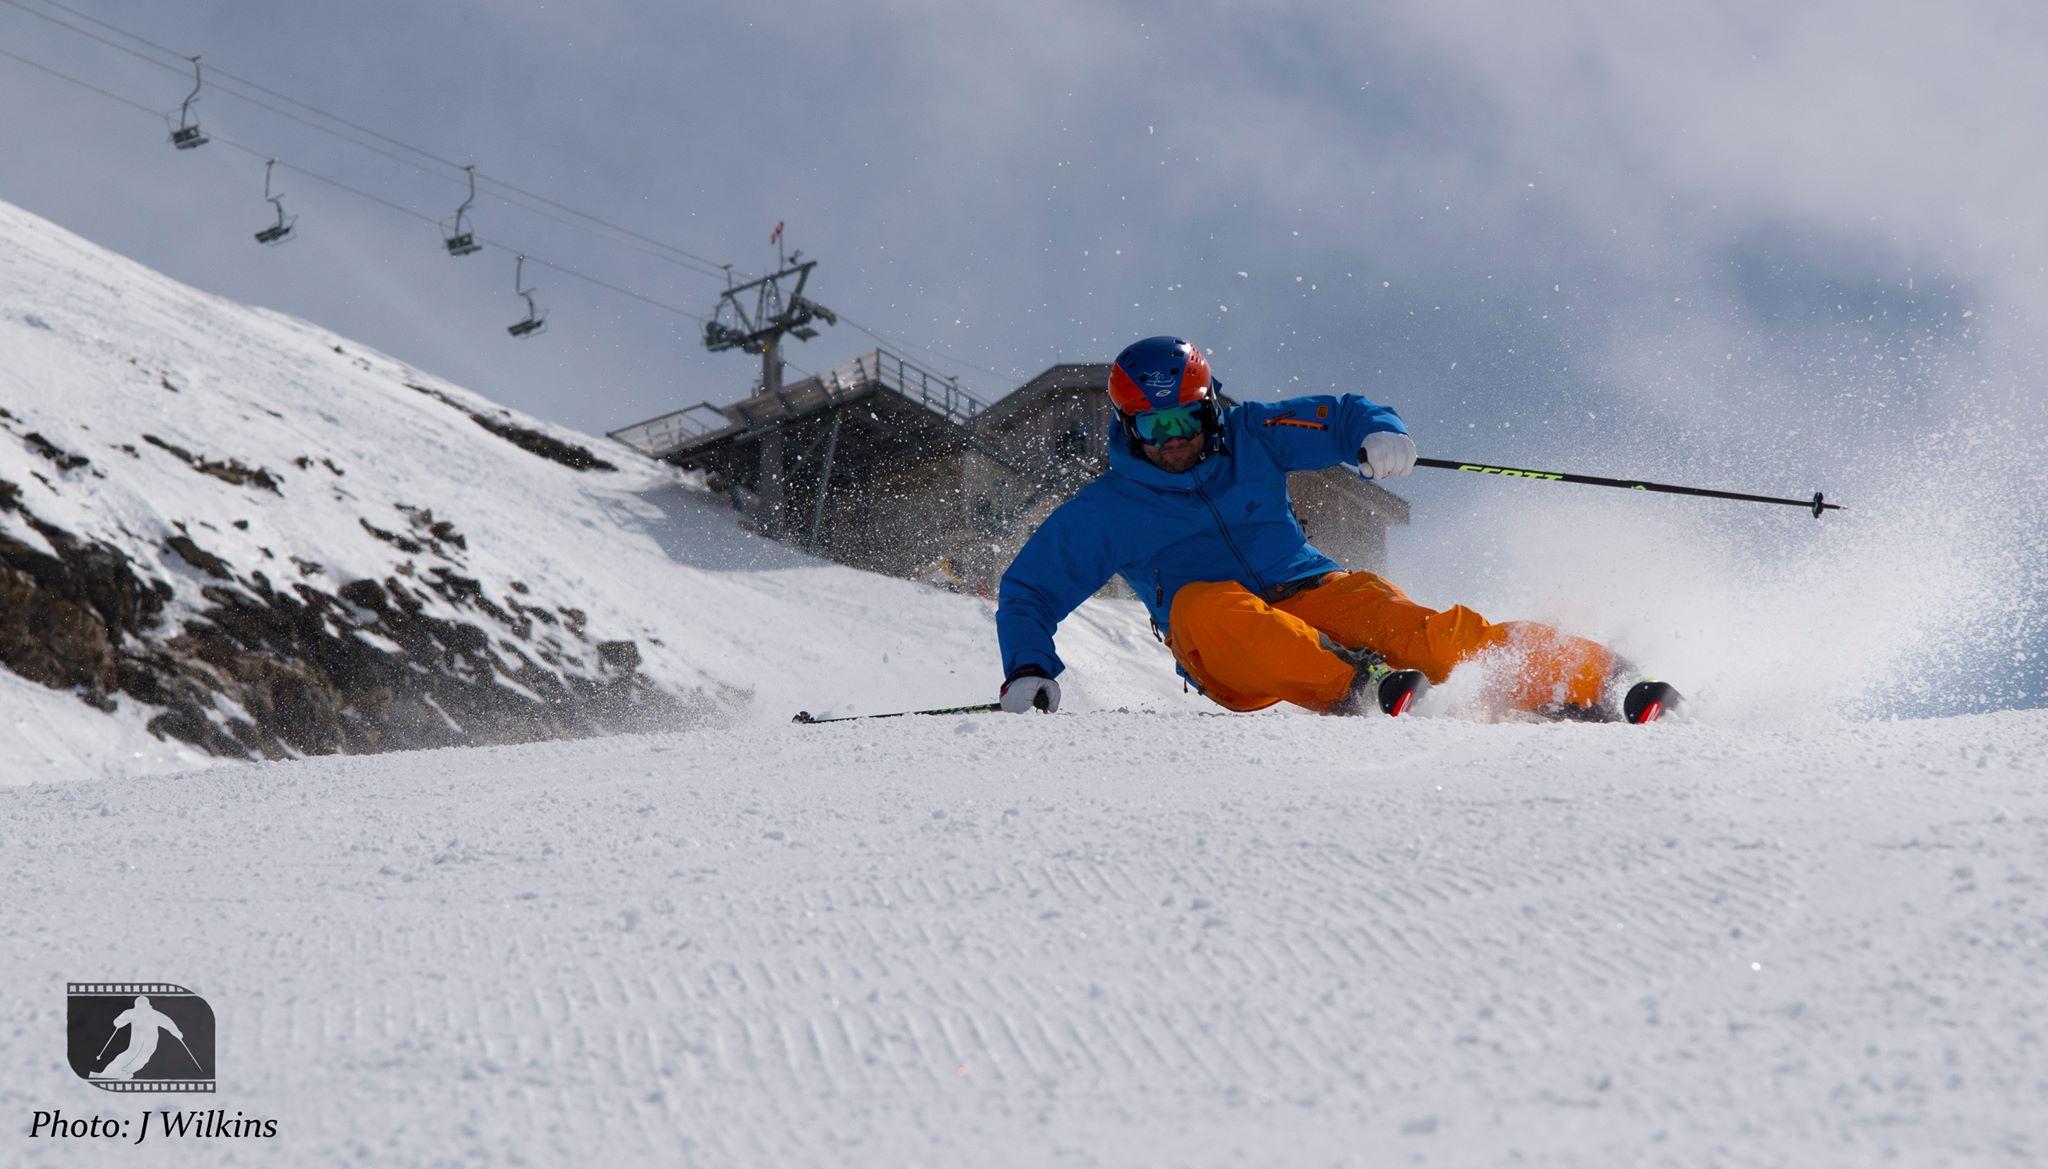 Elite Skiing - A-Team - Jon Ahlsen